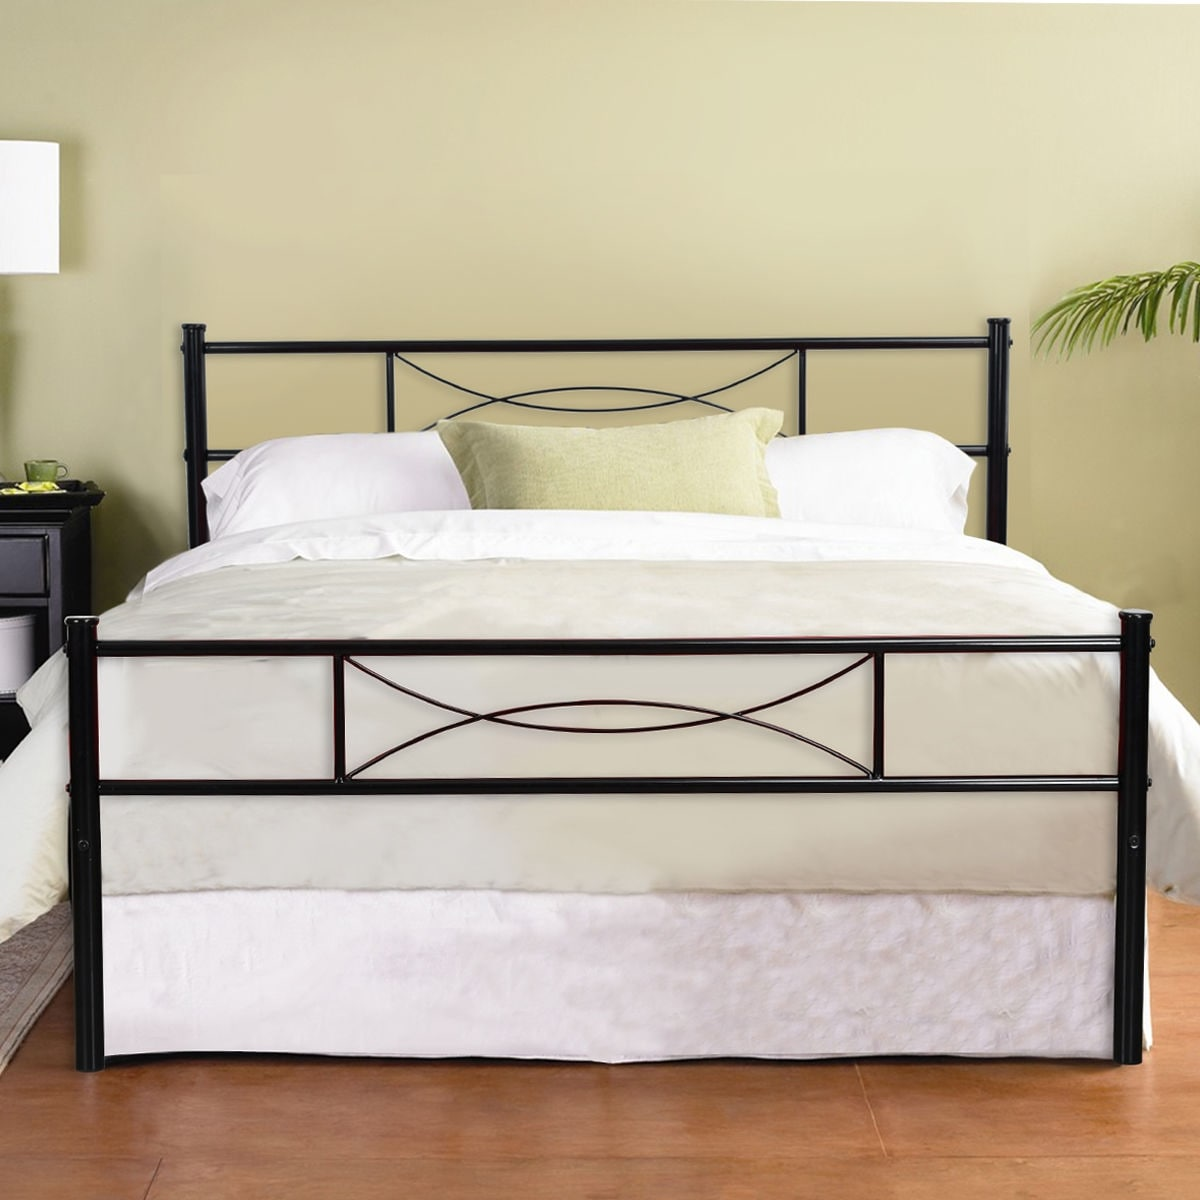 Shop 4 Color Metal Bed Frame Bedroom Furniture with headboard Full ...